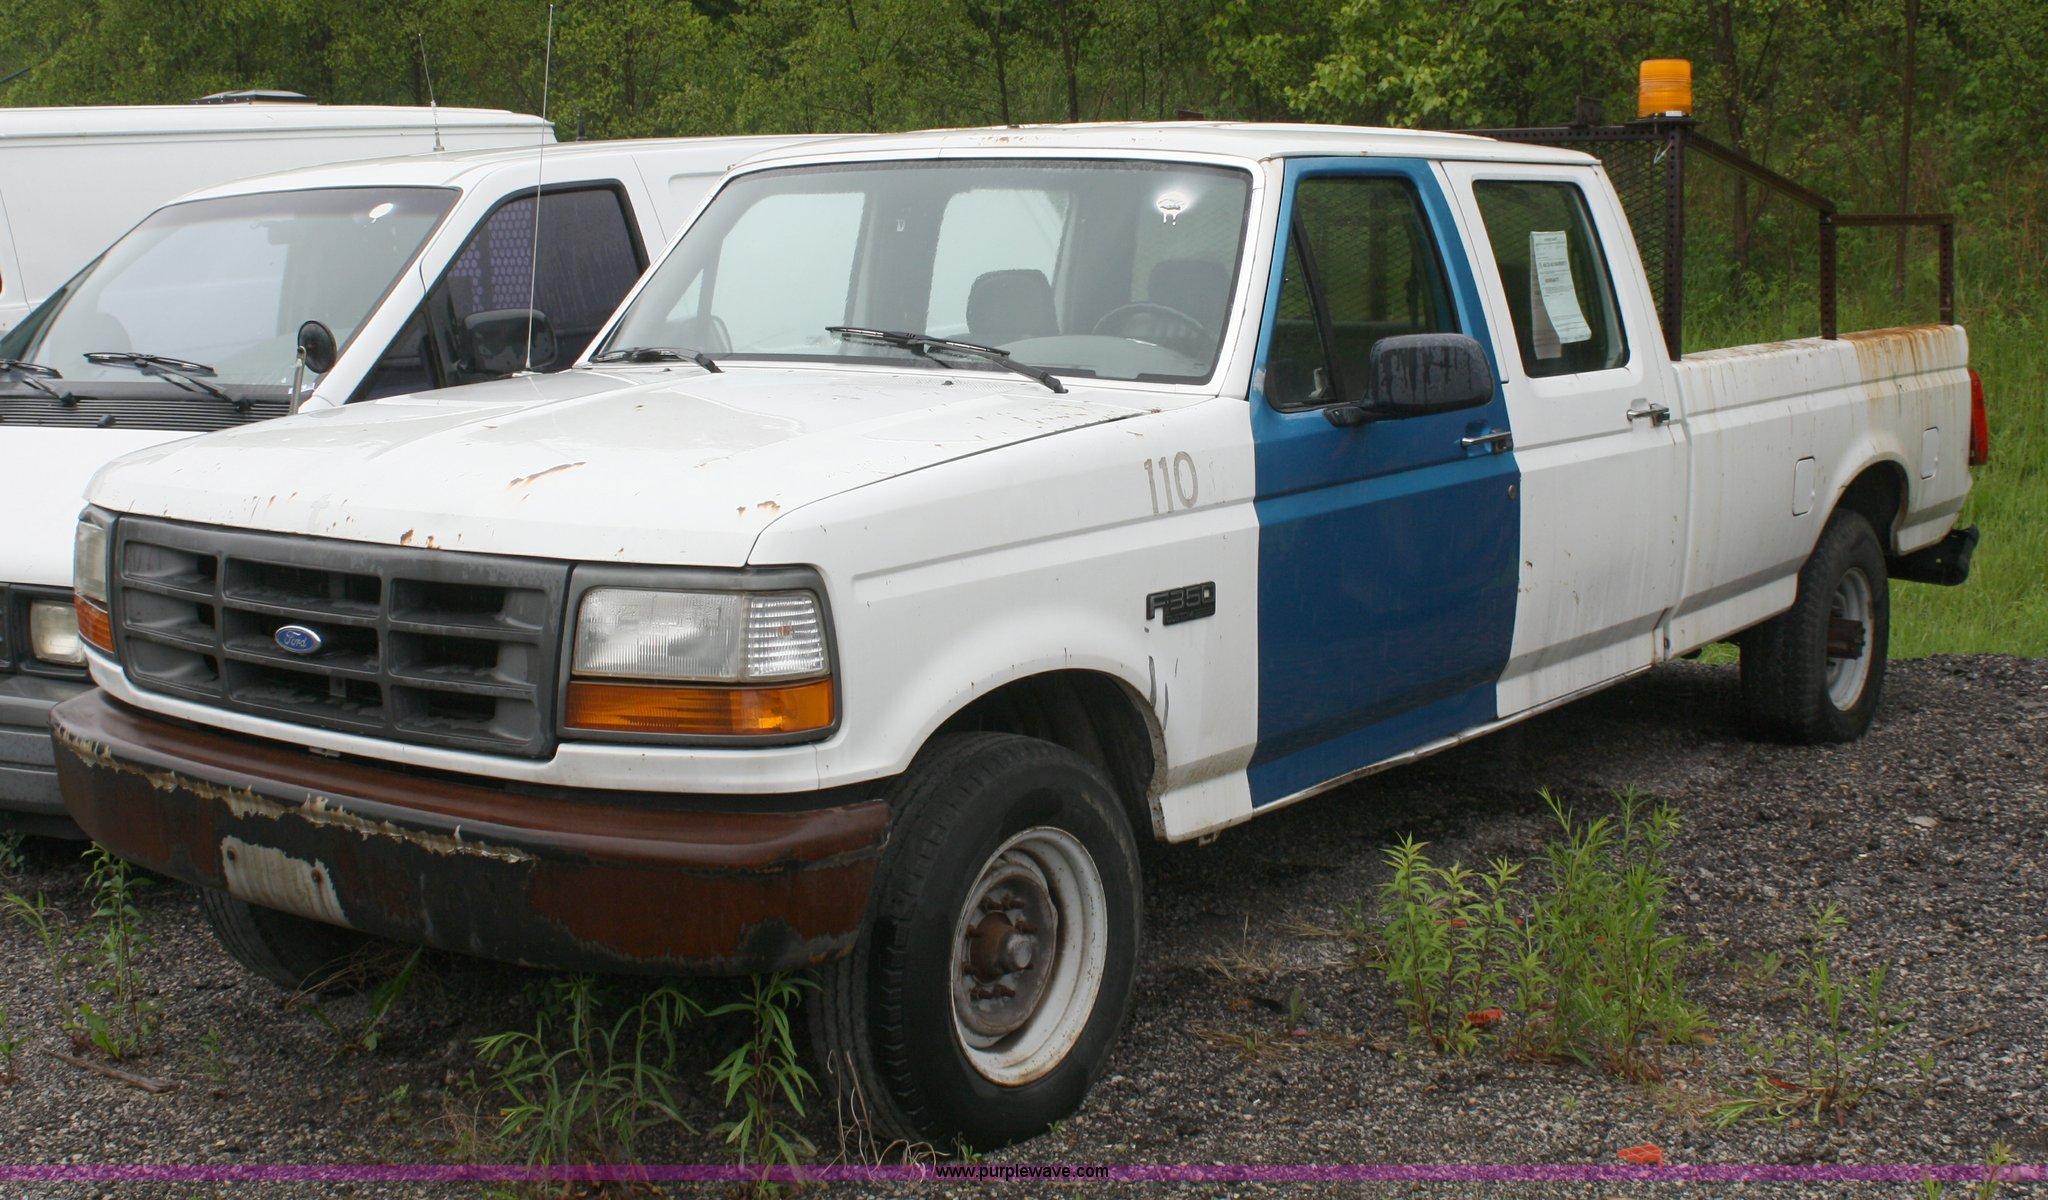 1992 ford f350 custom crew cab pickup truck item 2261. Black Bedroom Furniture Sets. Home Design Ideas